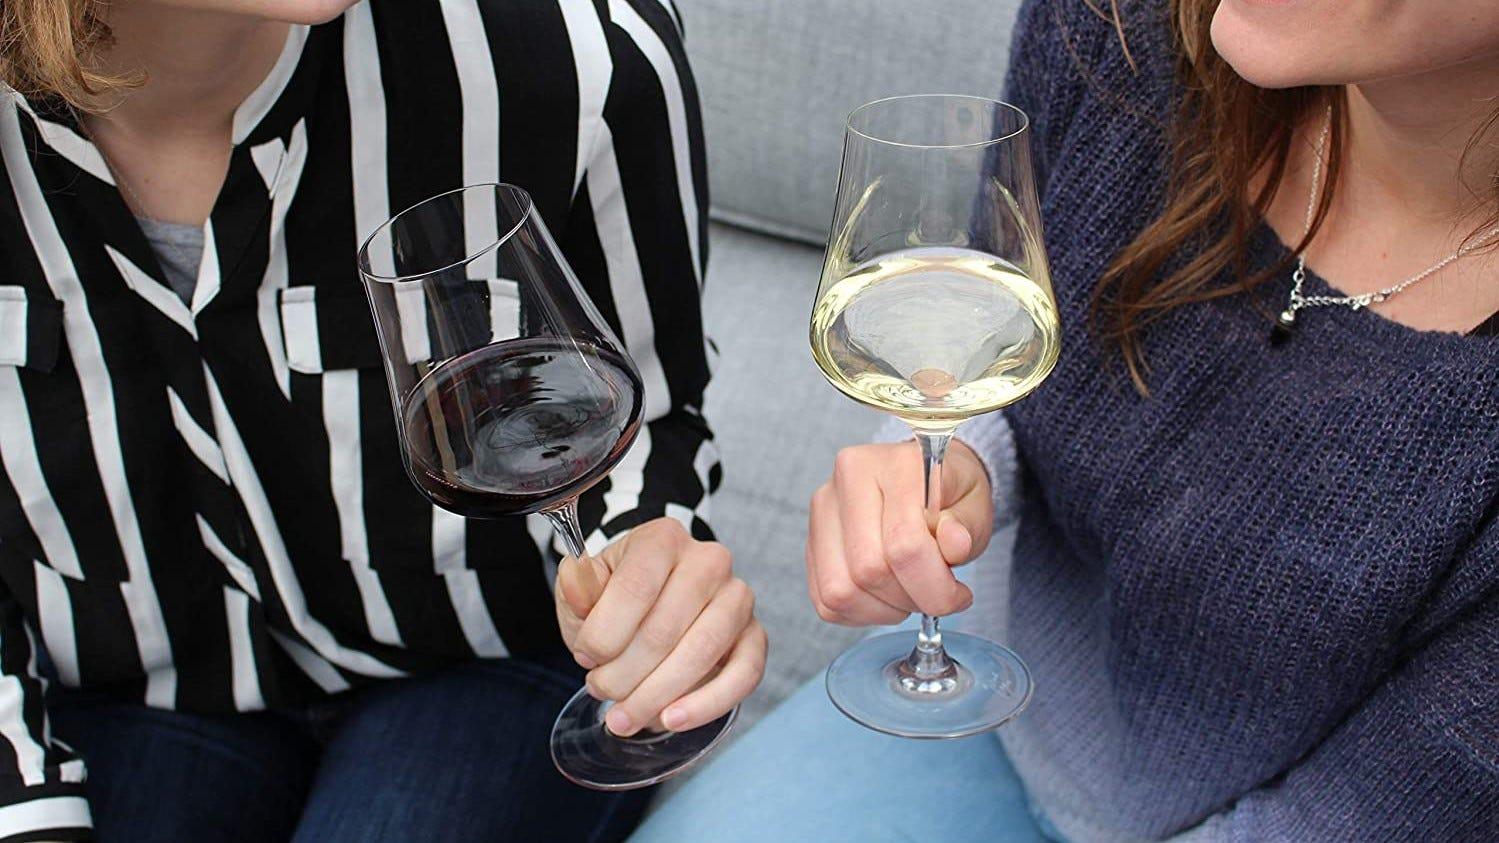 Two women holding Gabriel-Glas crystal wine glasses.